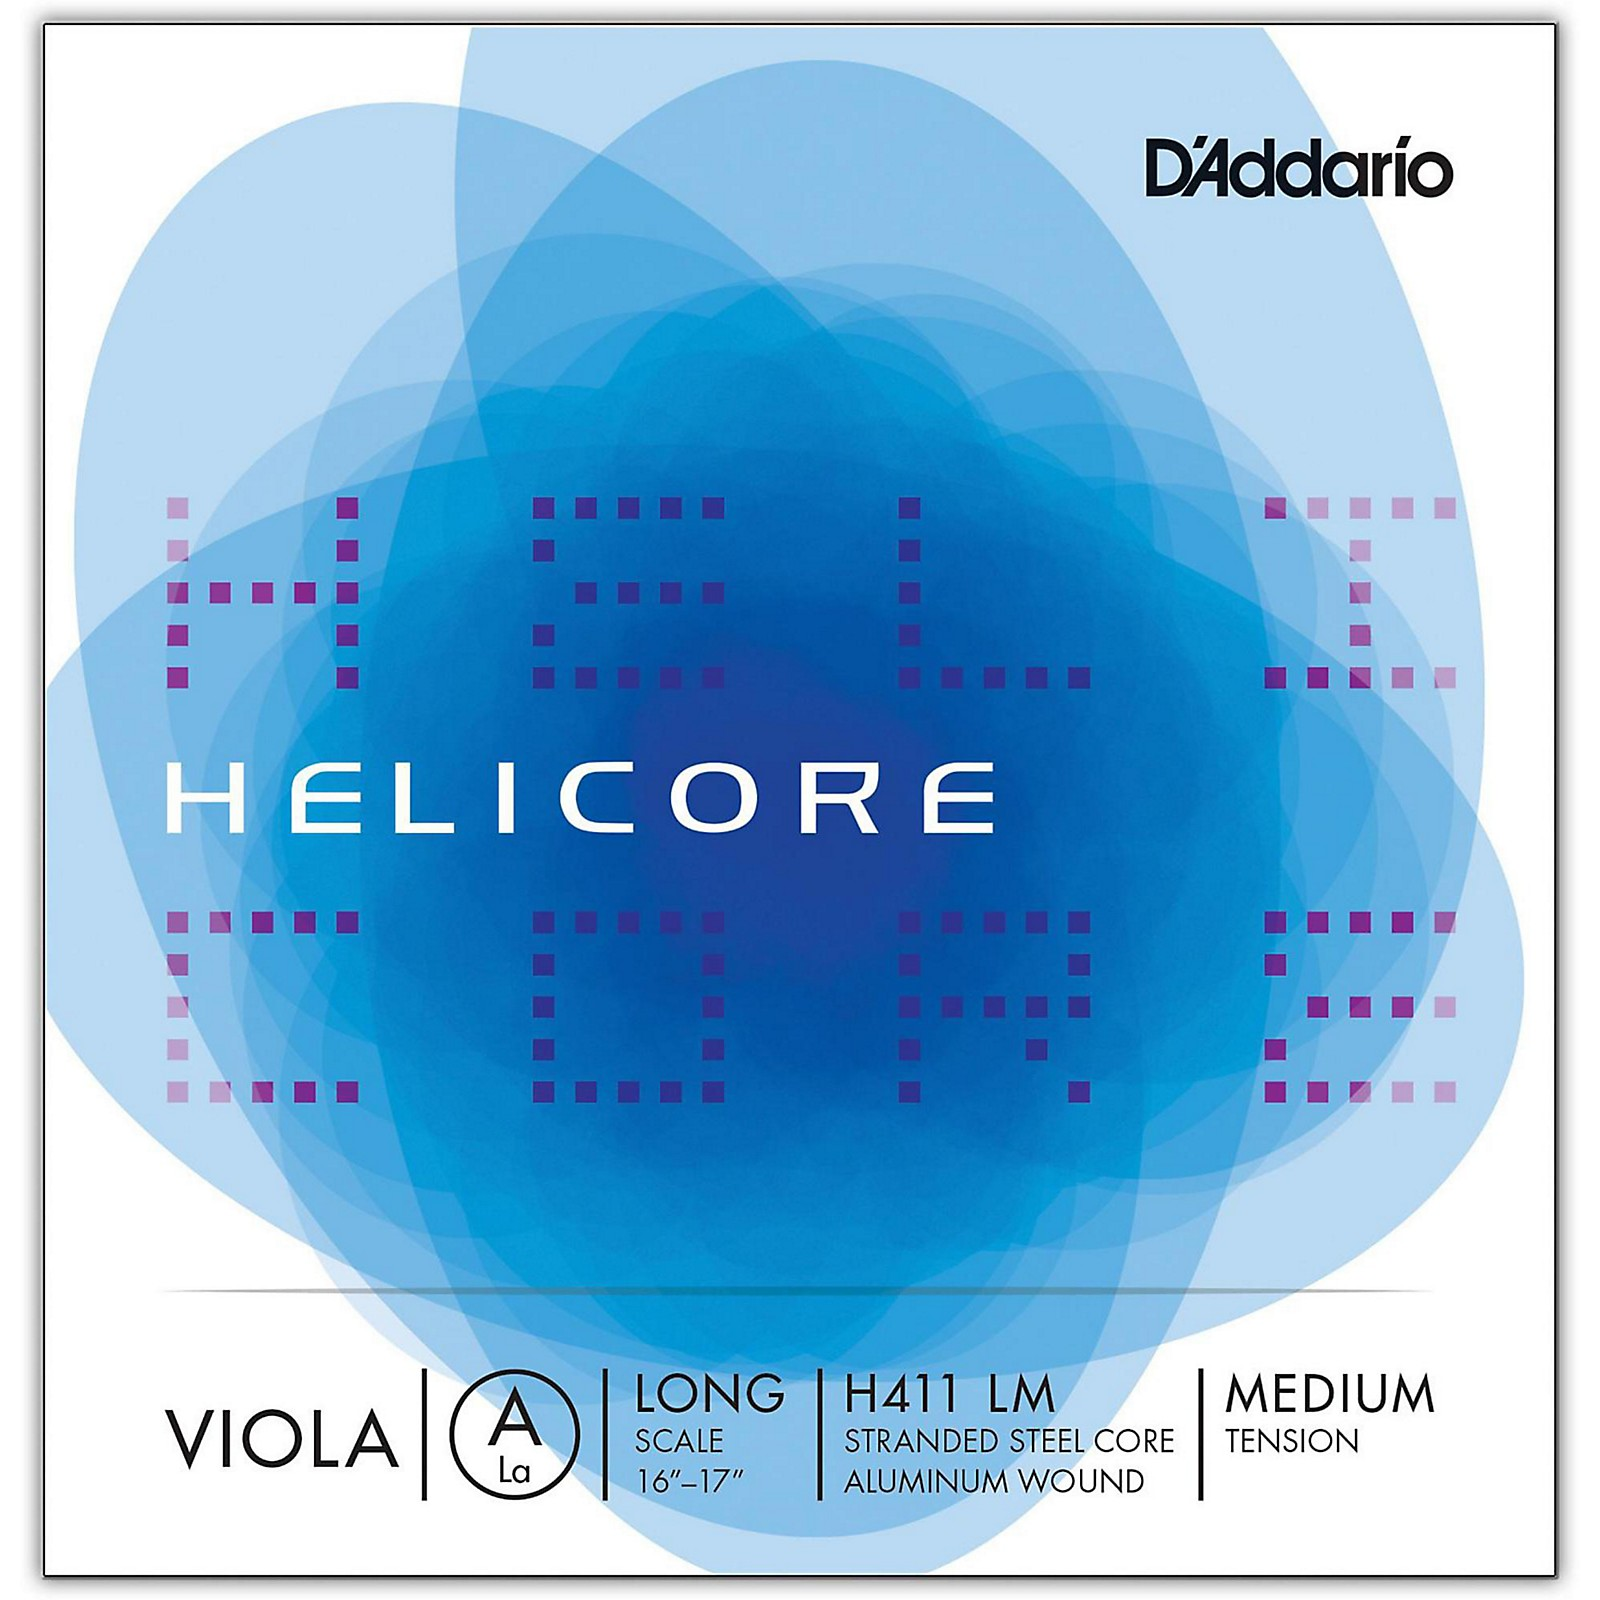 D'Addario Helicore Series Viola A String